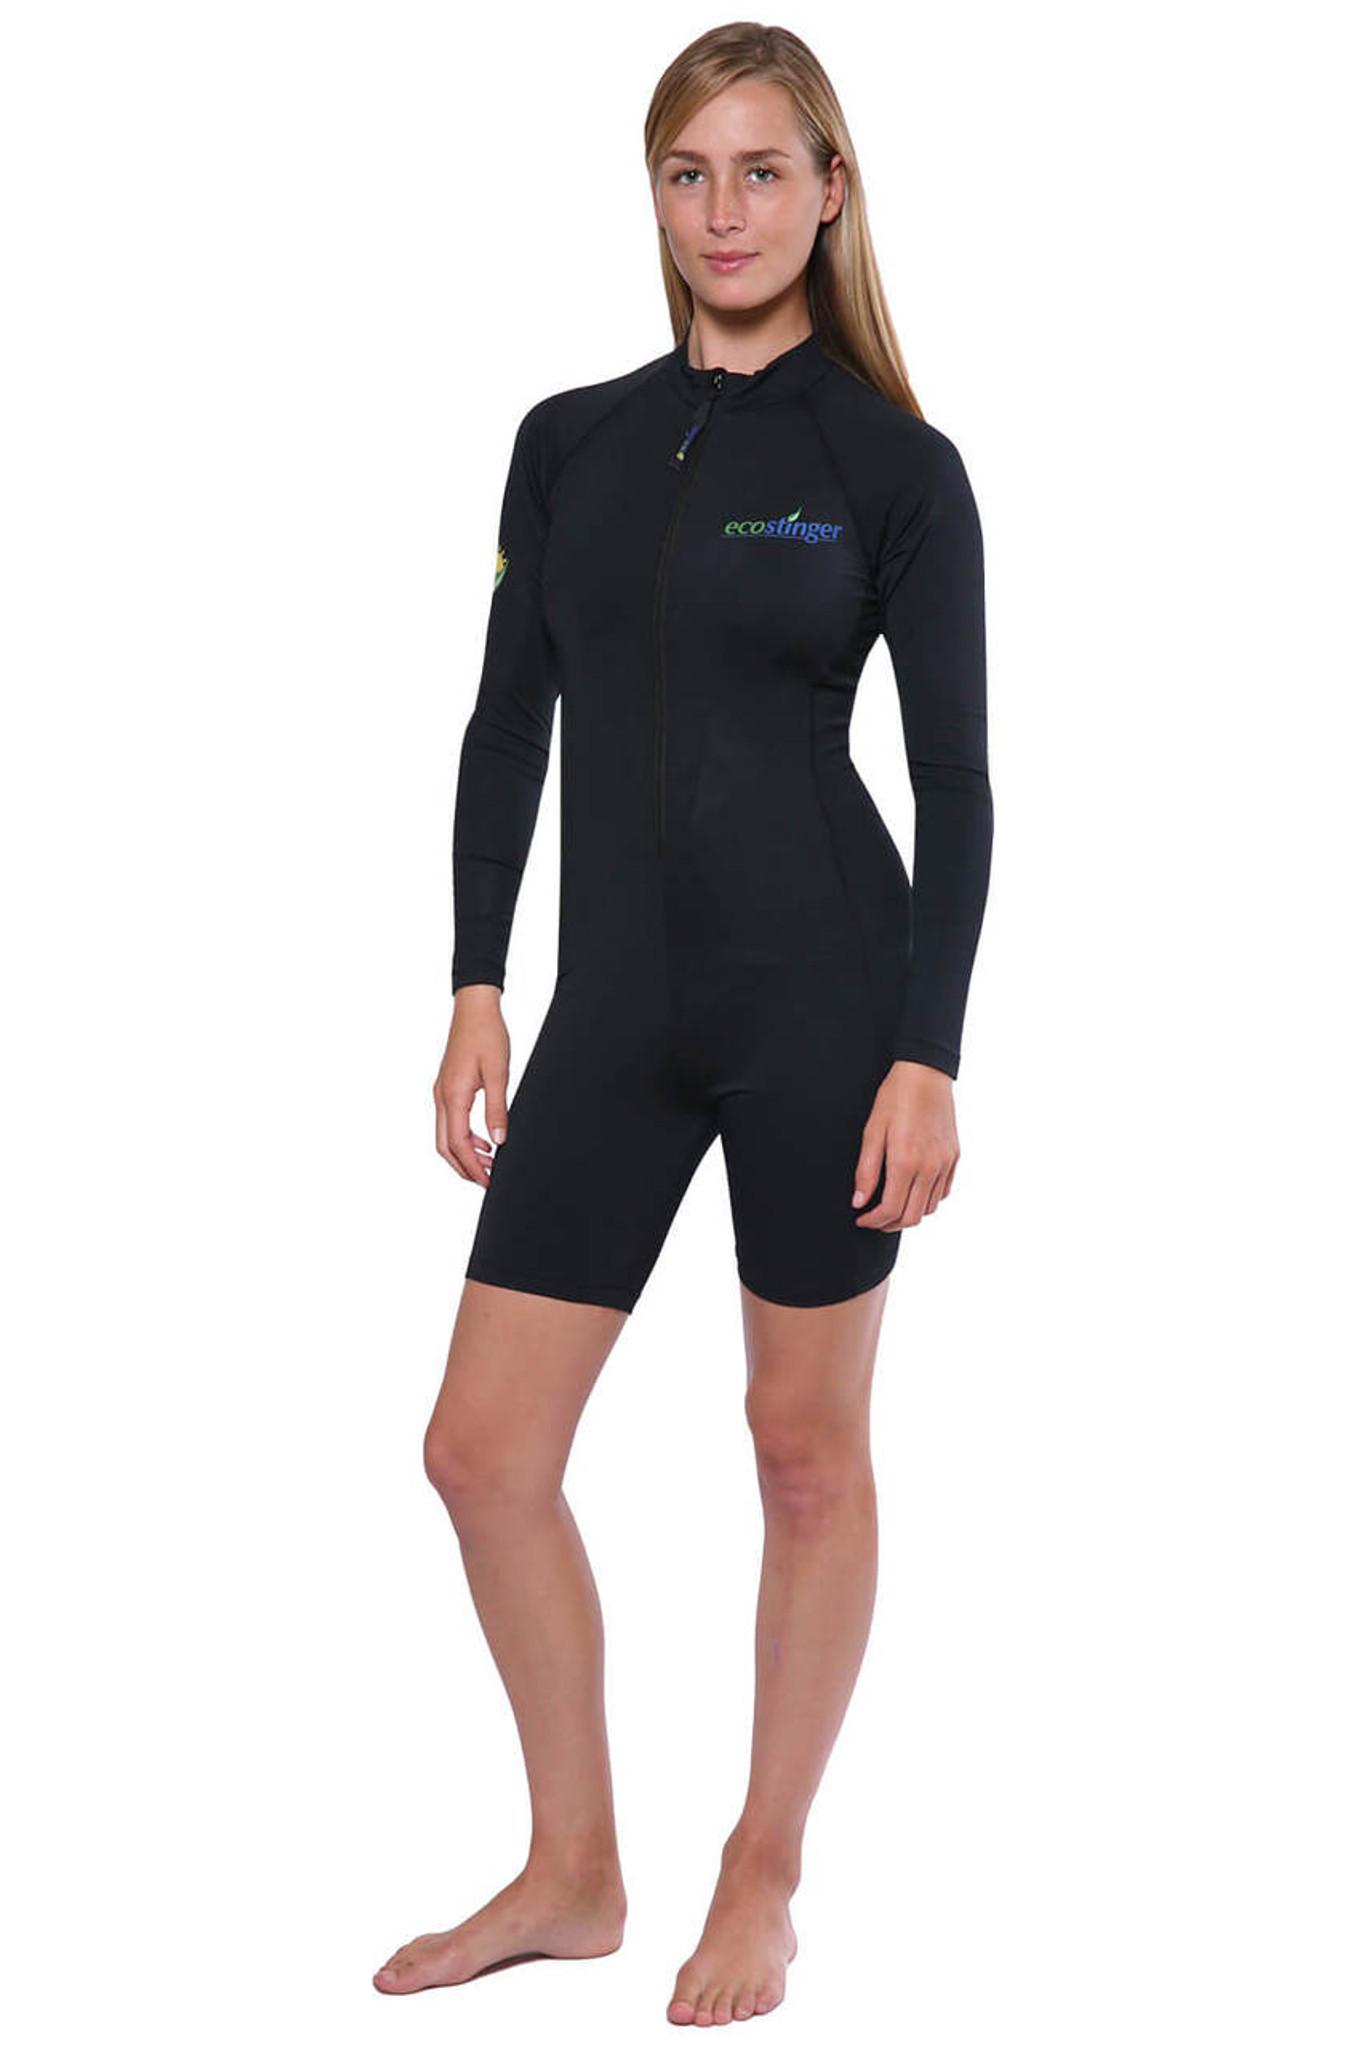 Women Sunsuit Bodysuit Long Sleeves Uv Protection Swimwear